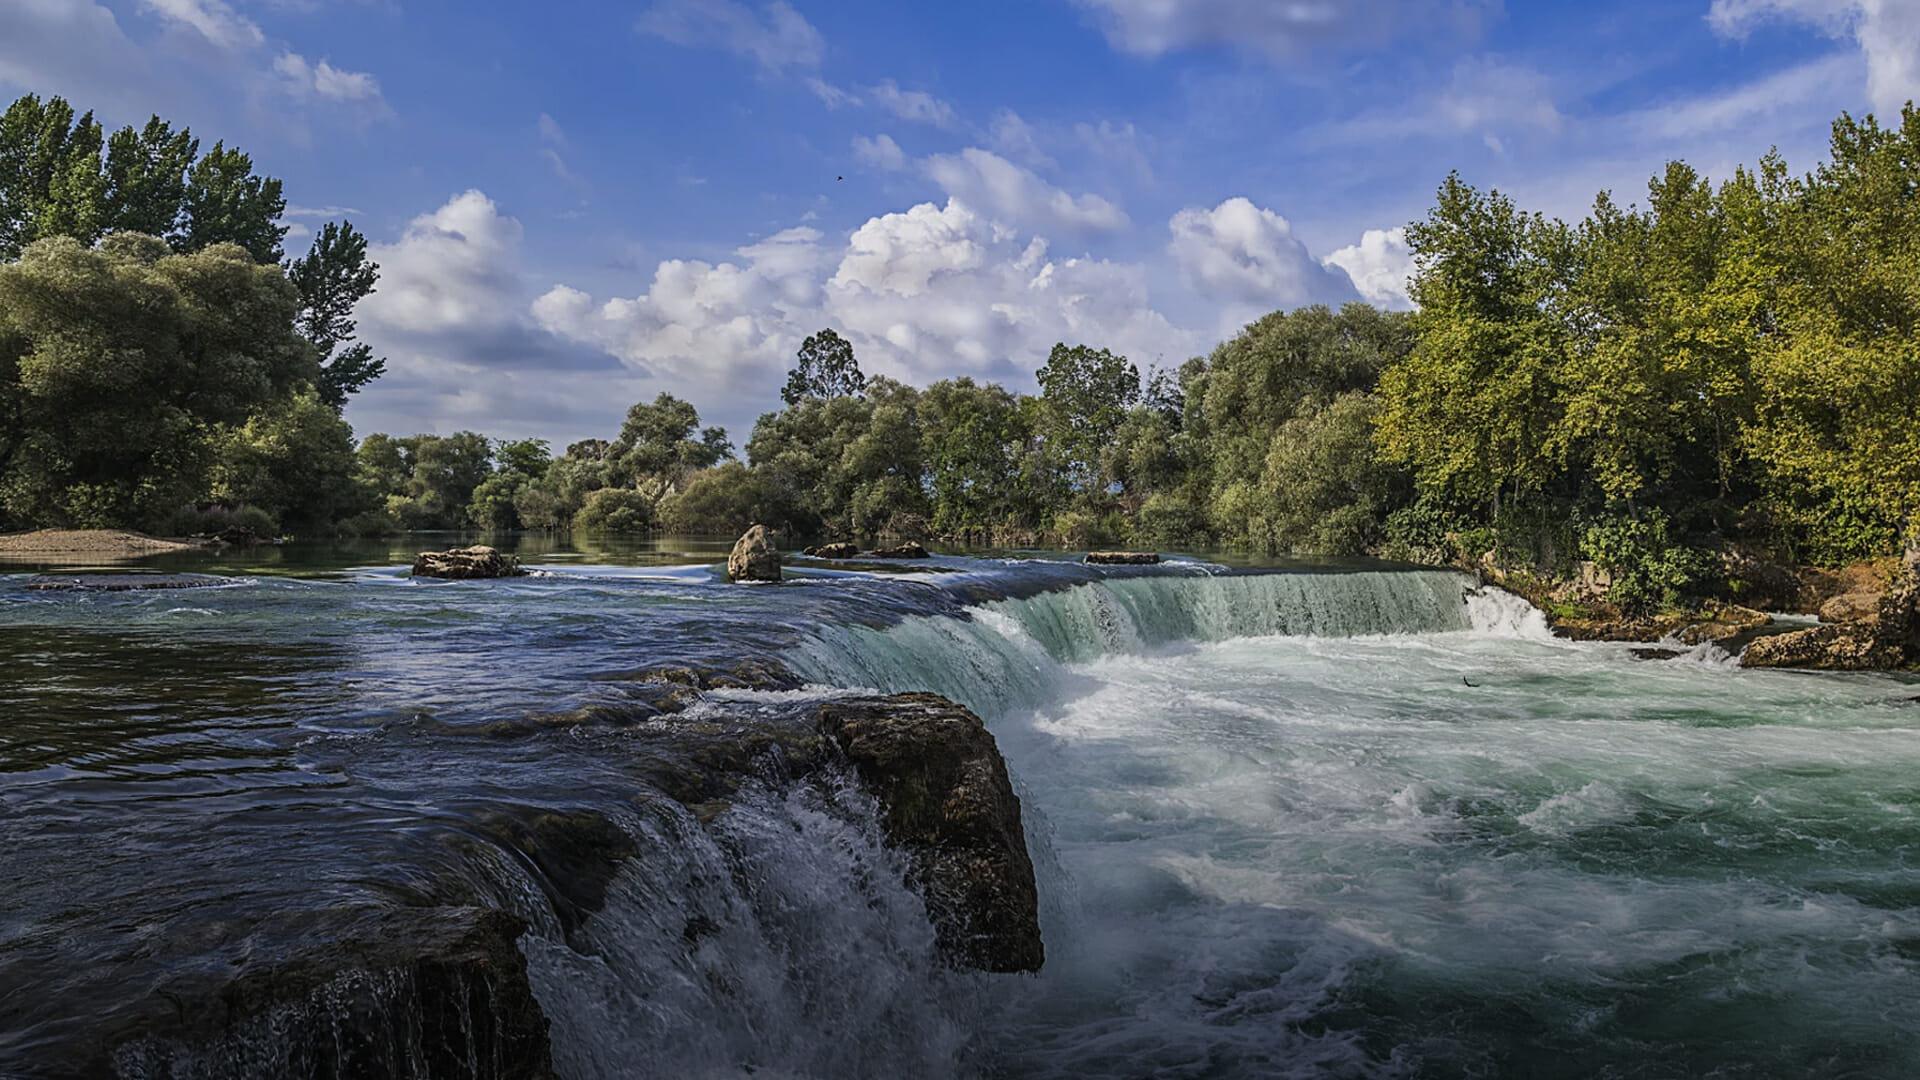 Manavgat waterfall 1 - بالصور.. تعرف على شلالات مانافجات الساحرة في ولاية أنطاليا التركية